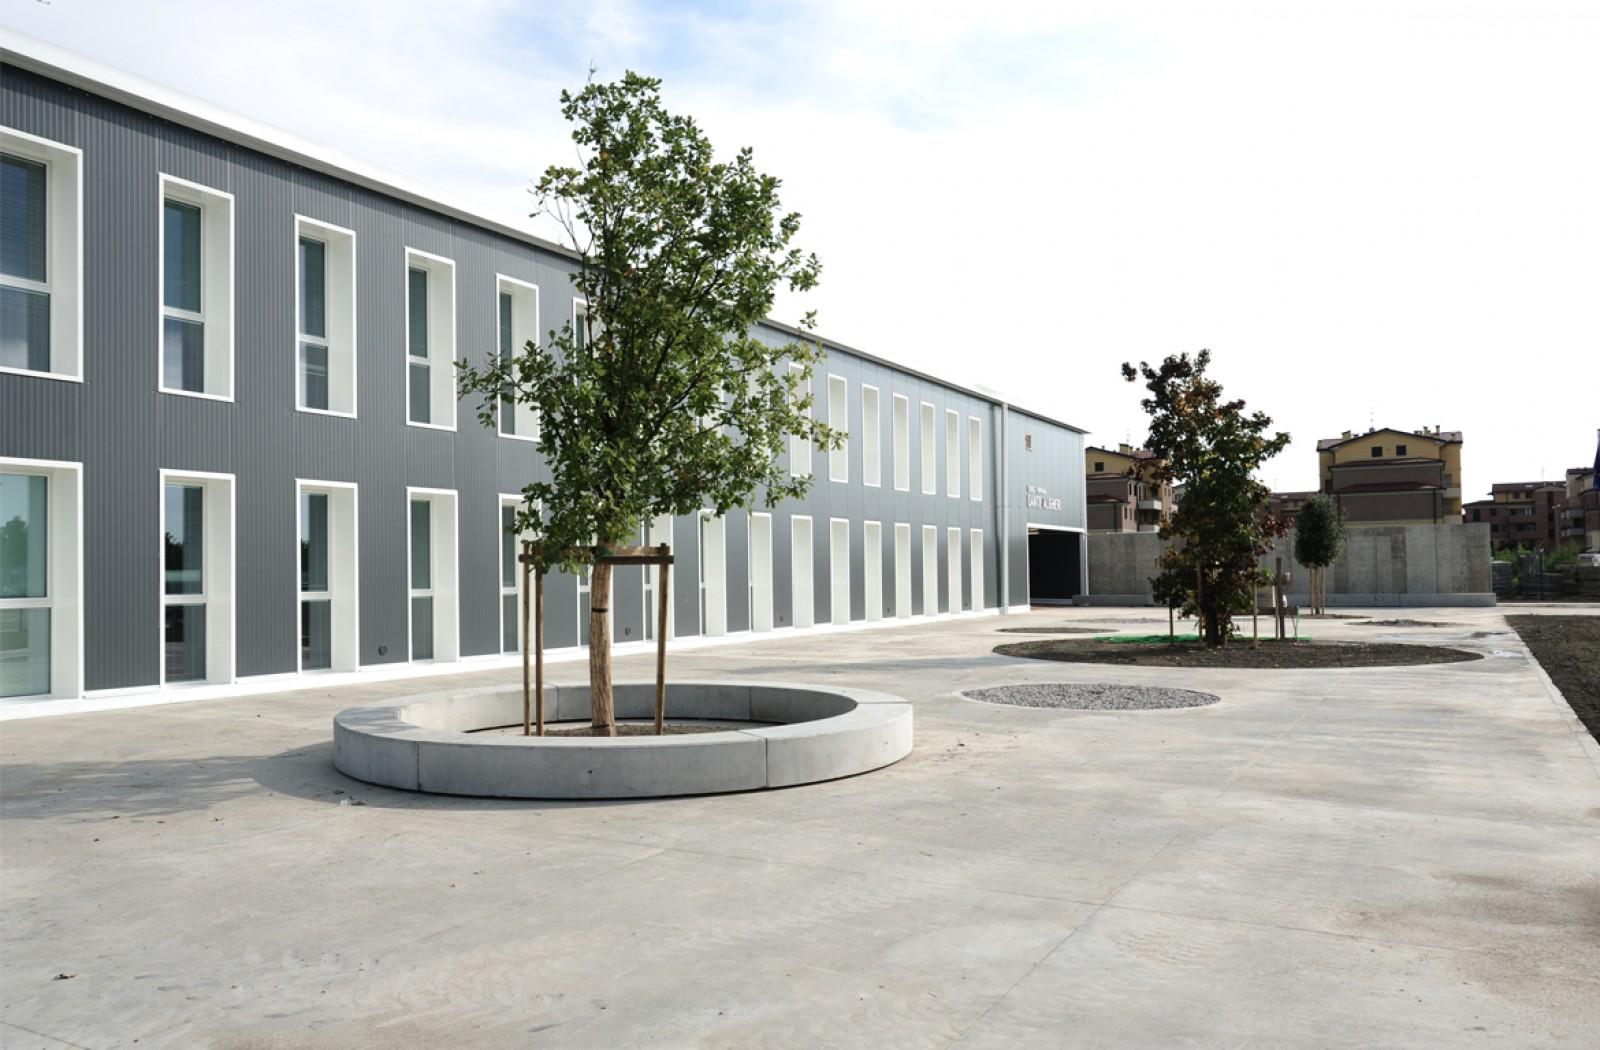 Dante Alighieri Primary School